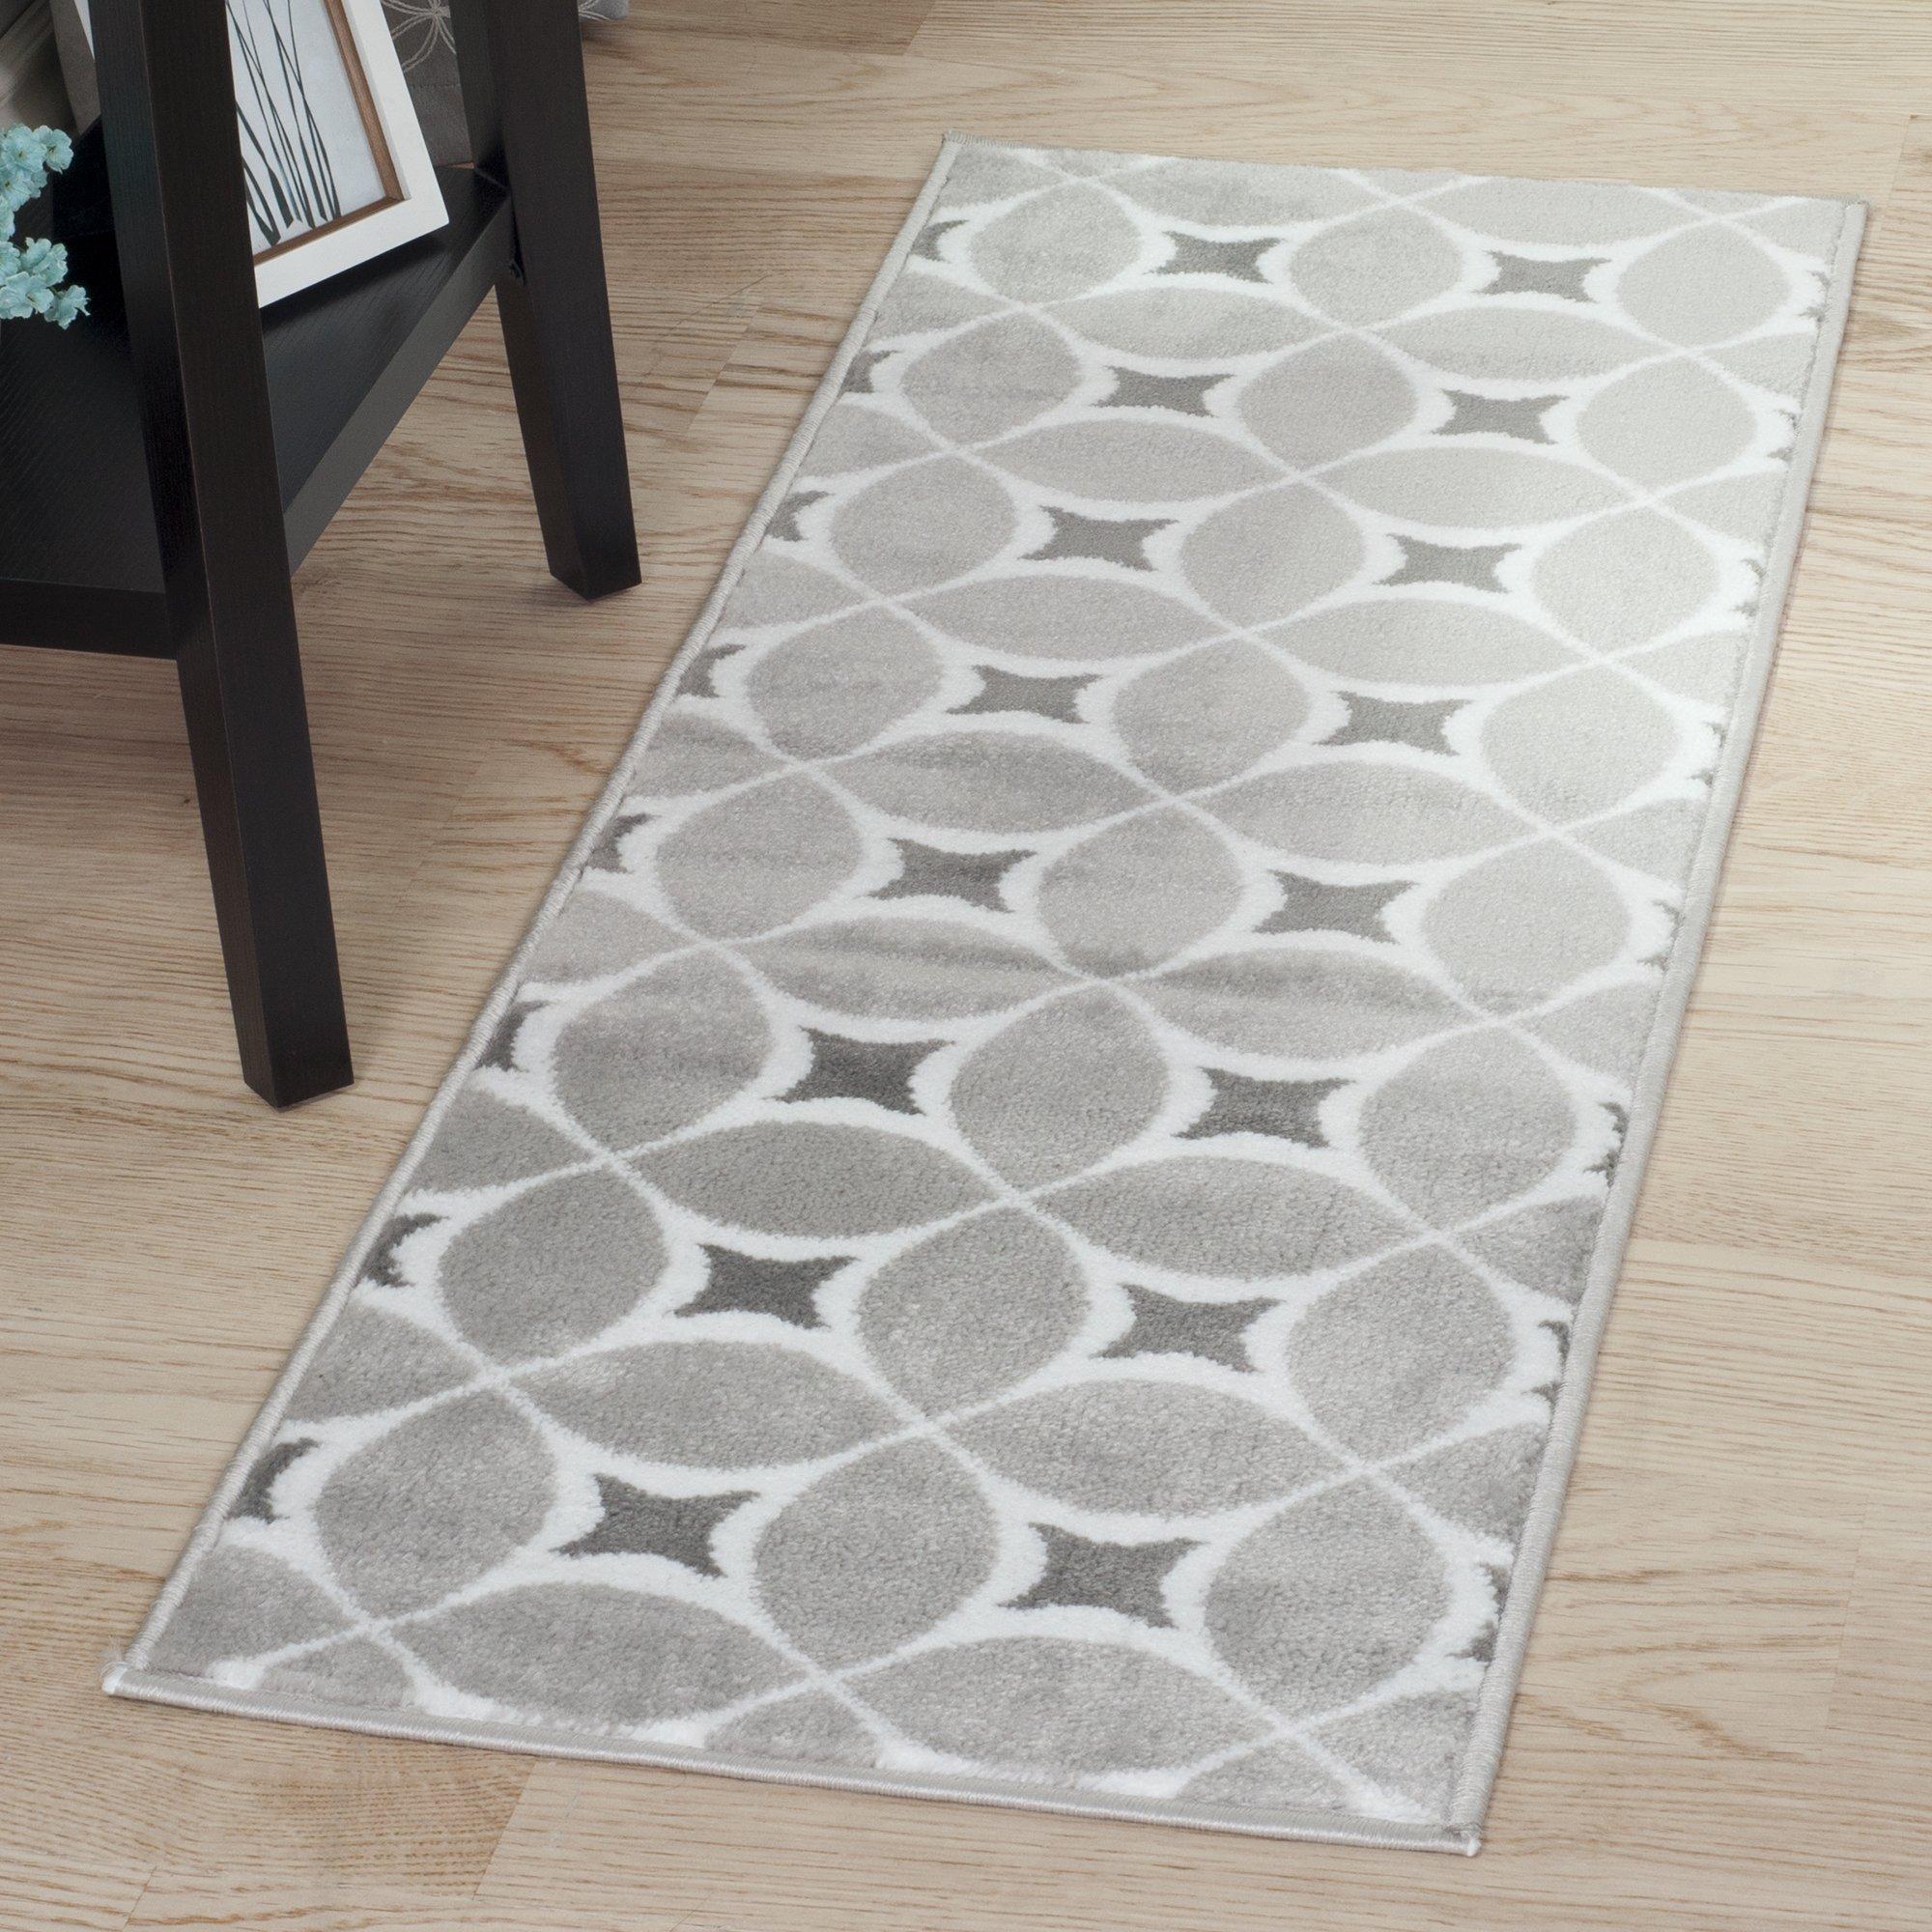 Lavish Home Jane Area Rug, 1'8'' by 5', Grey/White